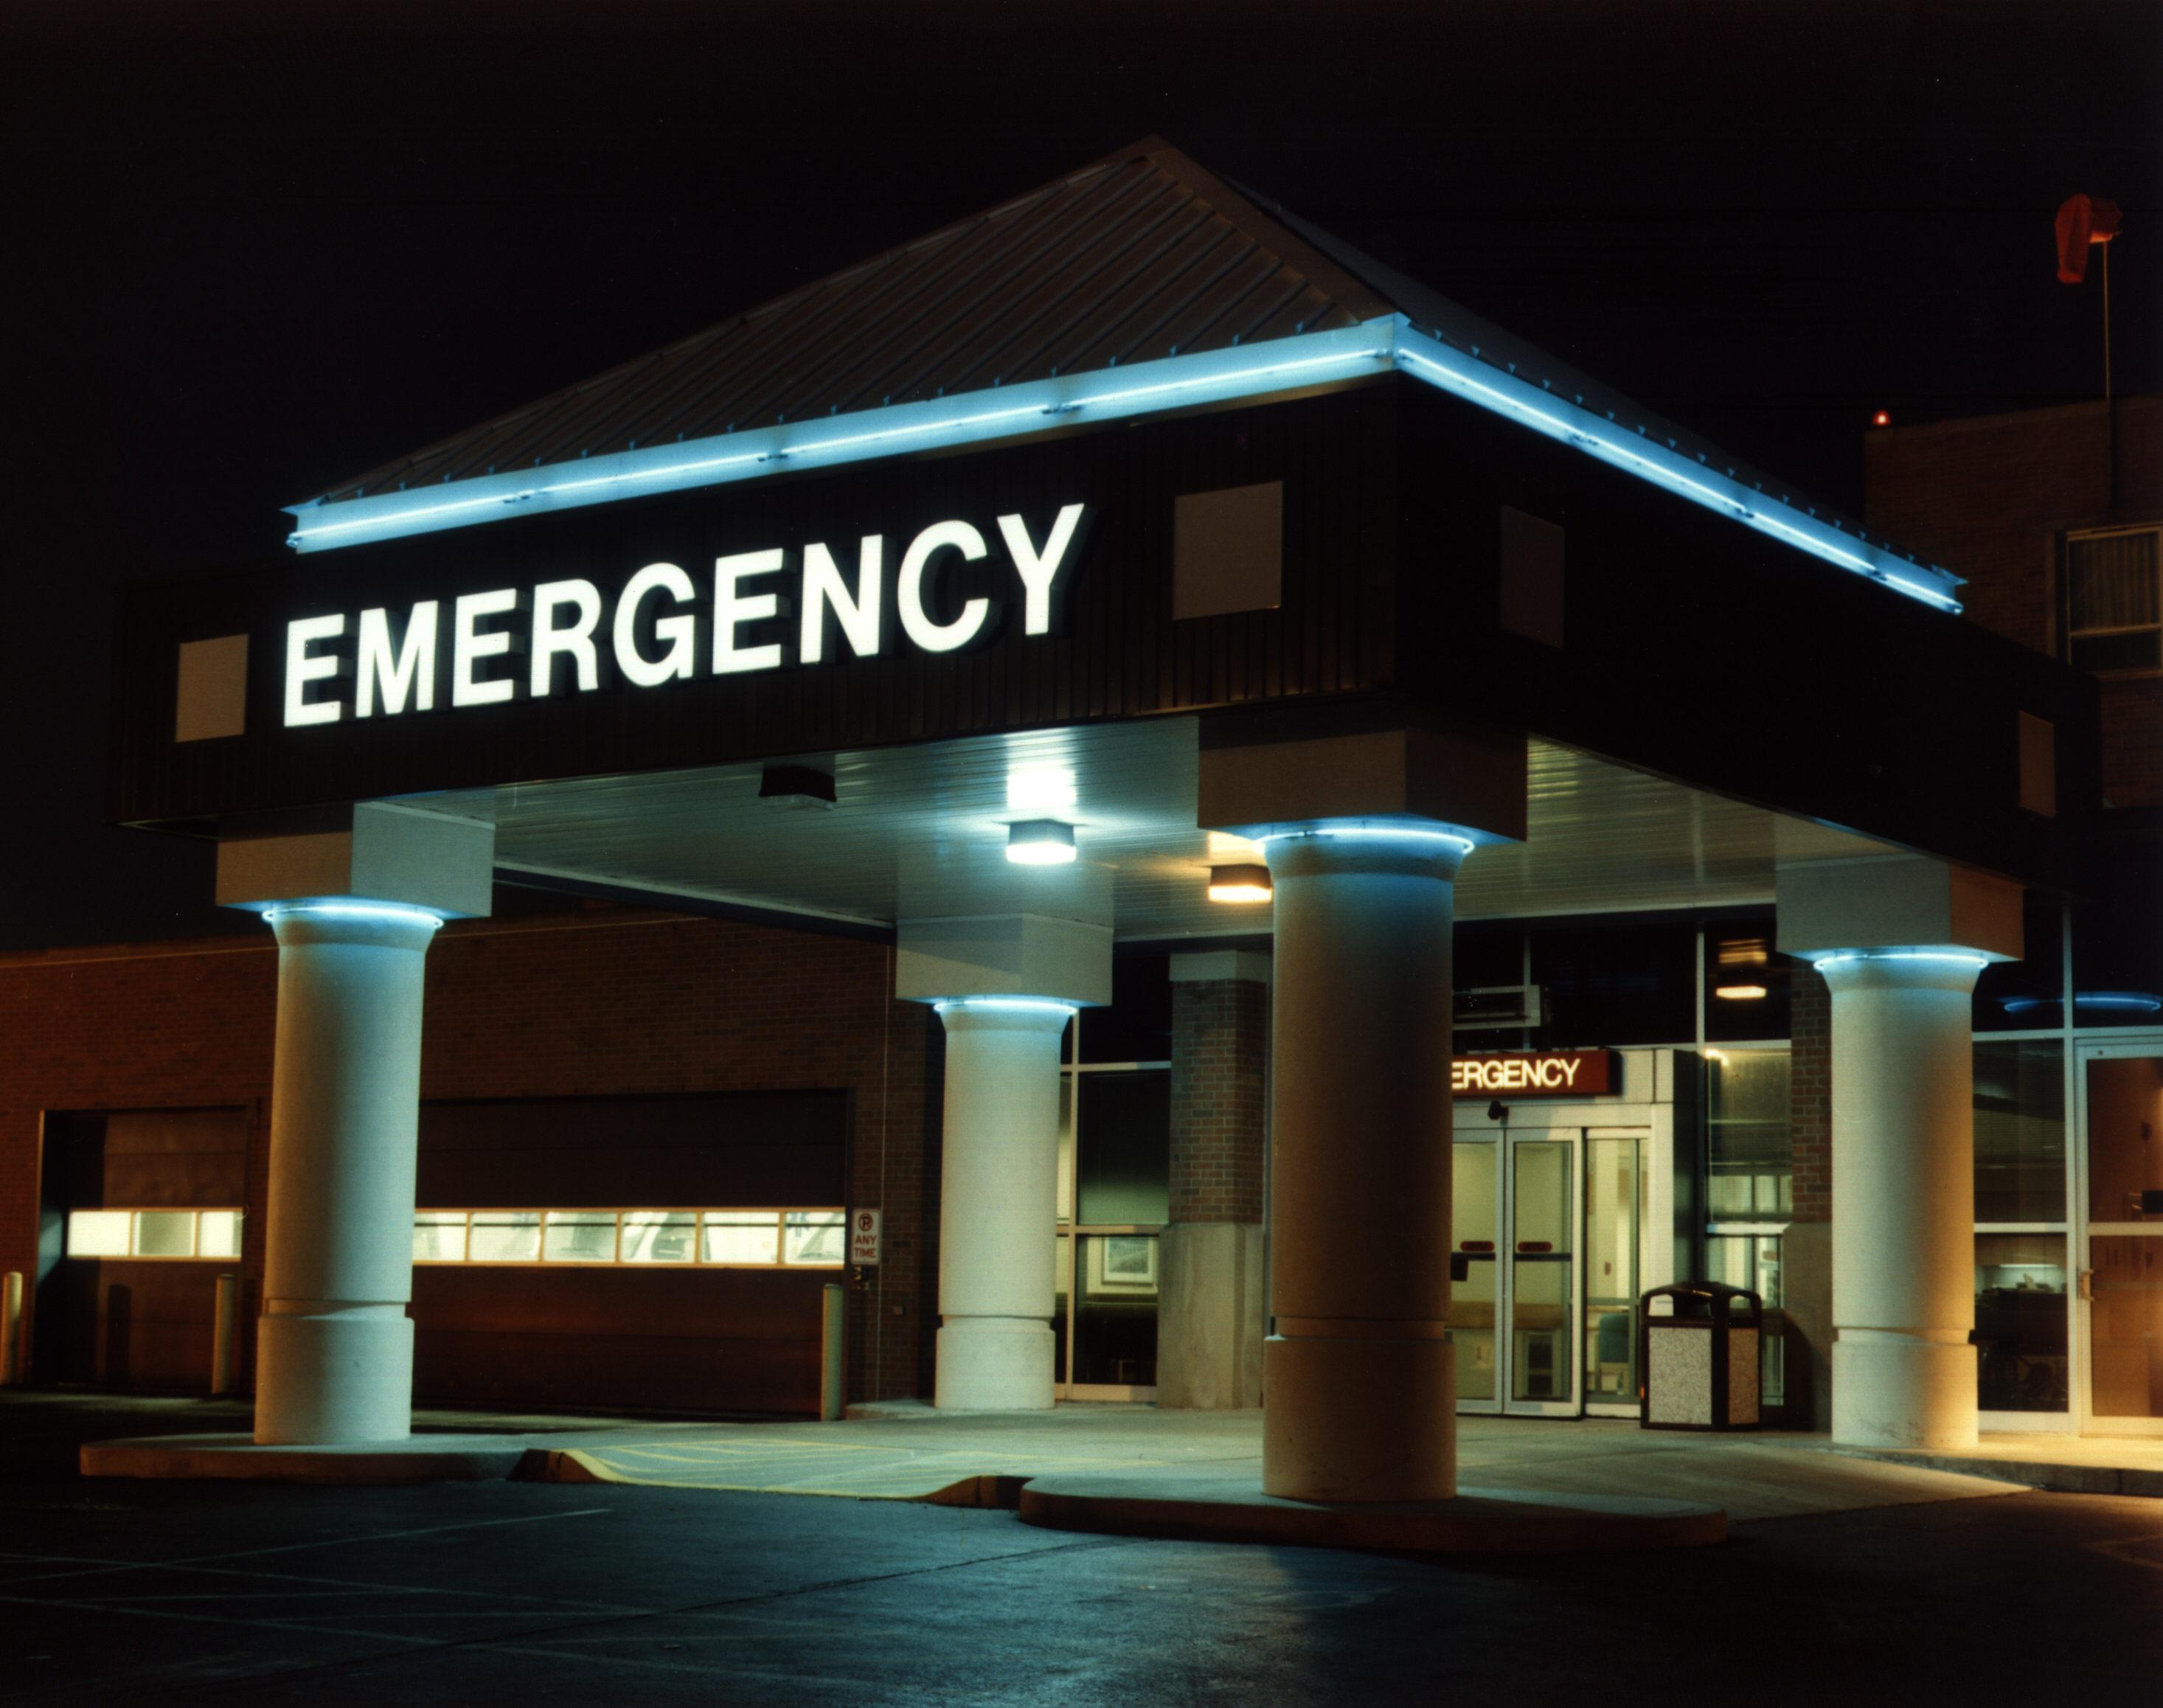 howard double emergency.jpg